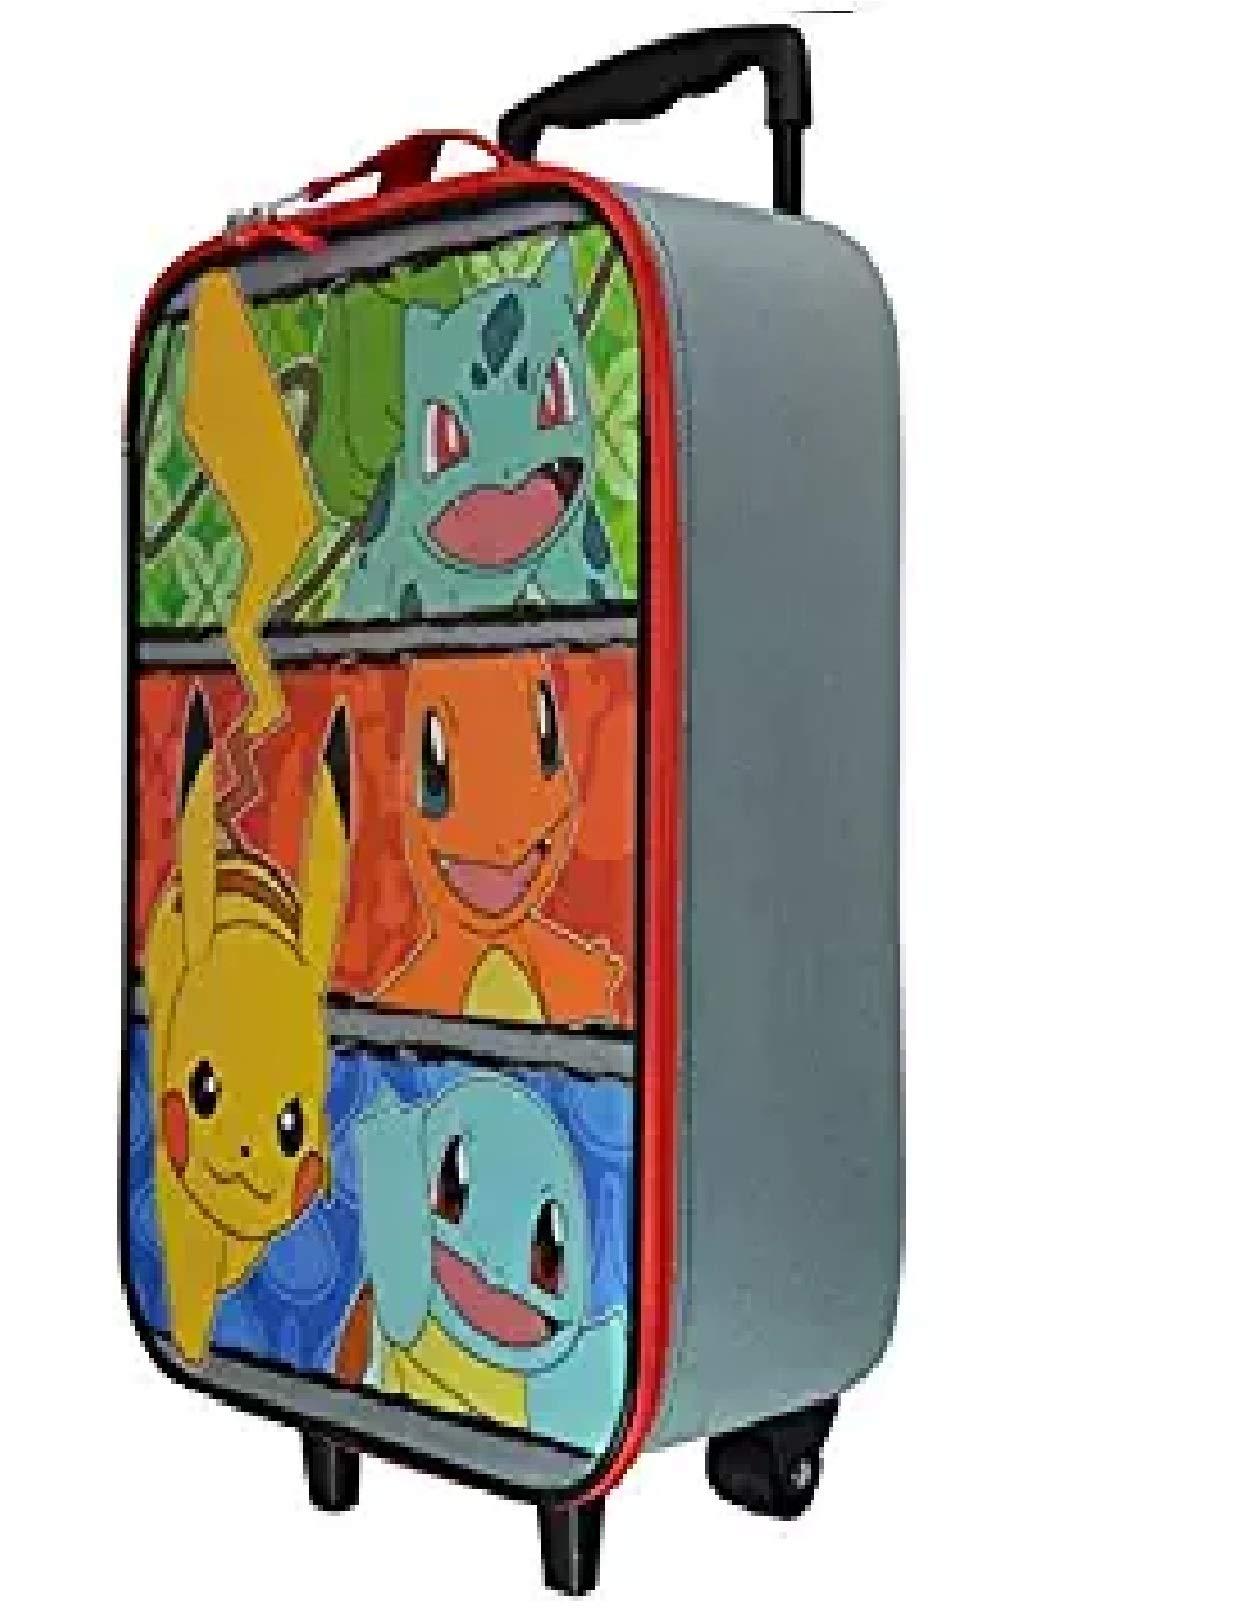 Pokemon Pikachu Friends Large Pilot Case - Kid's Luggage  